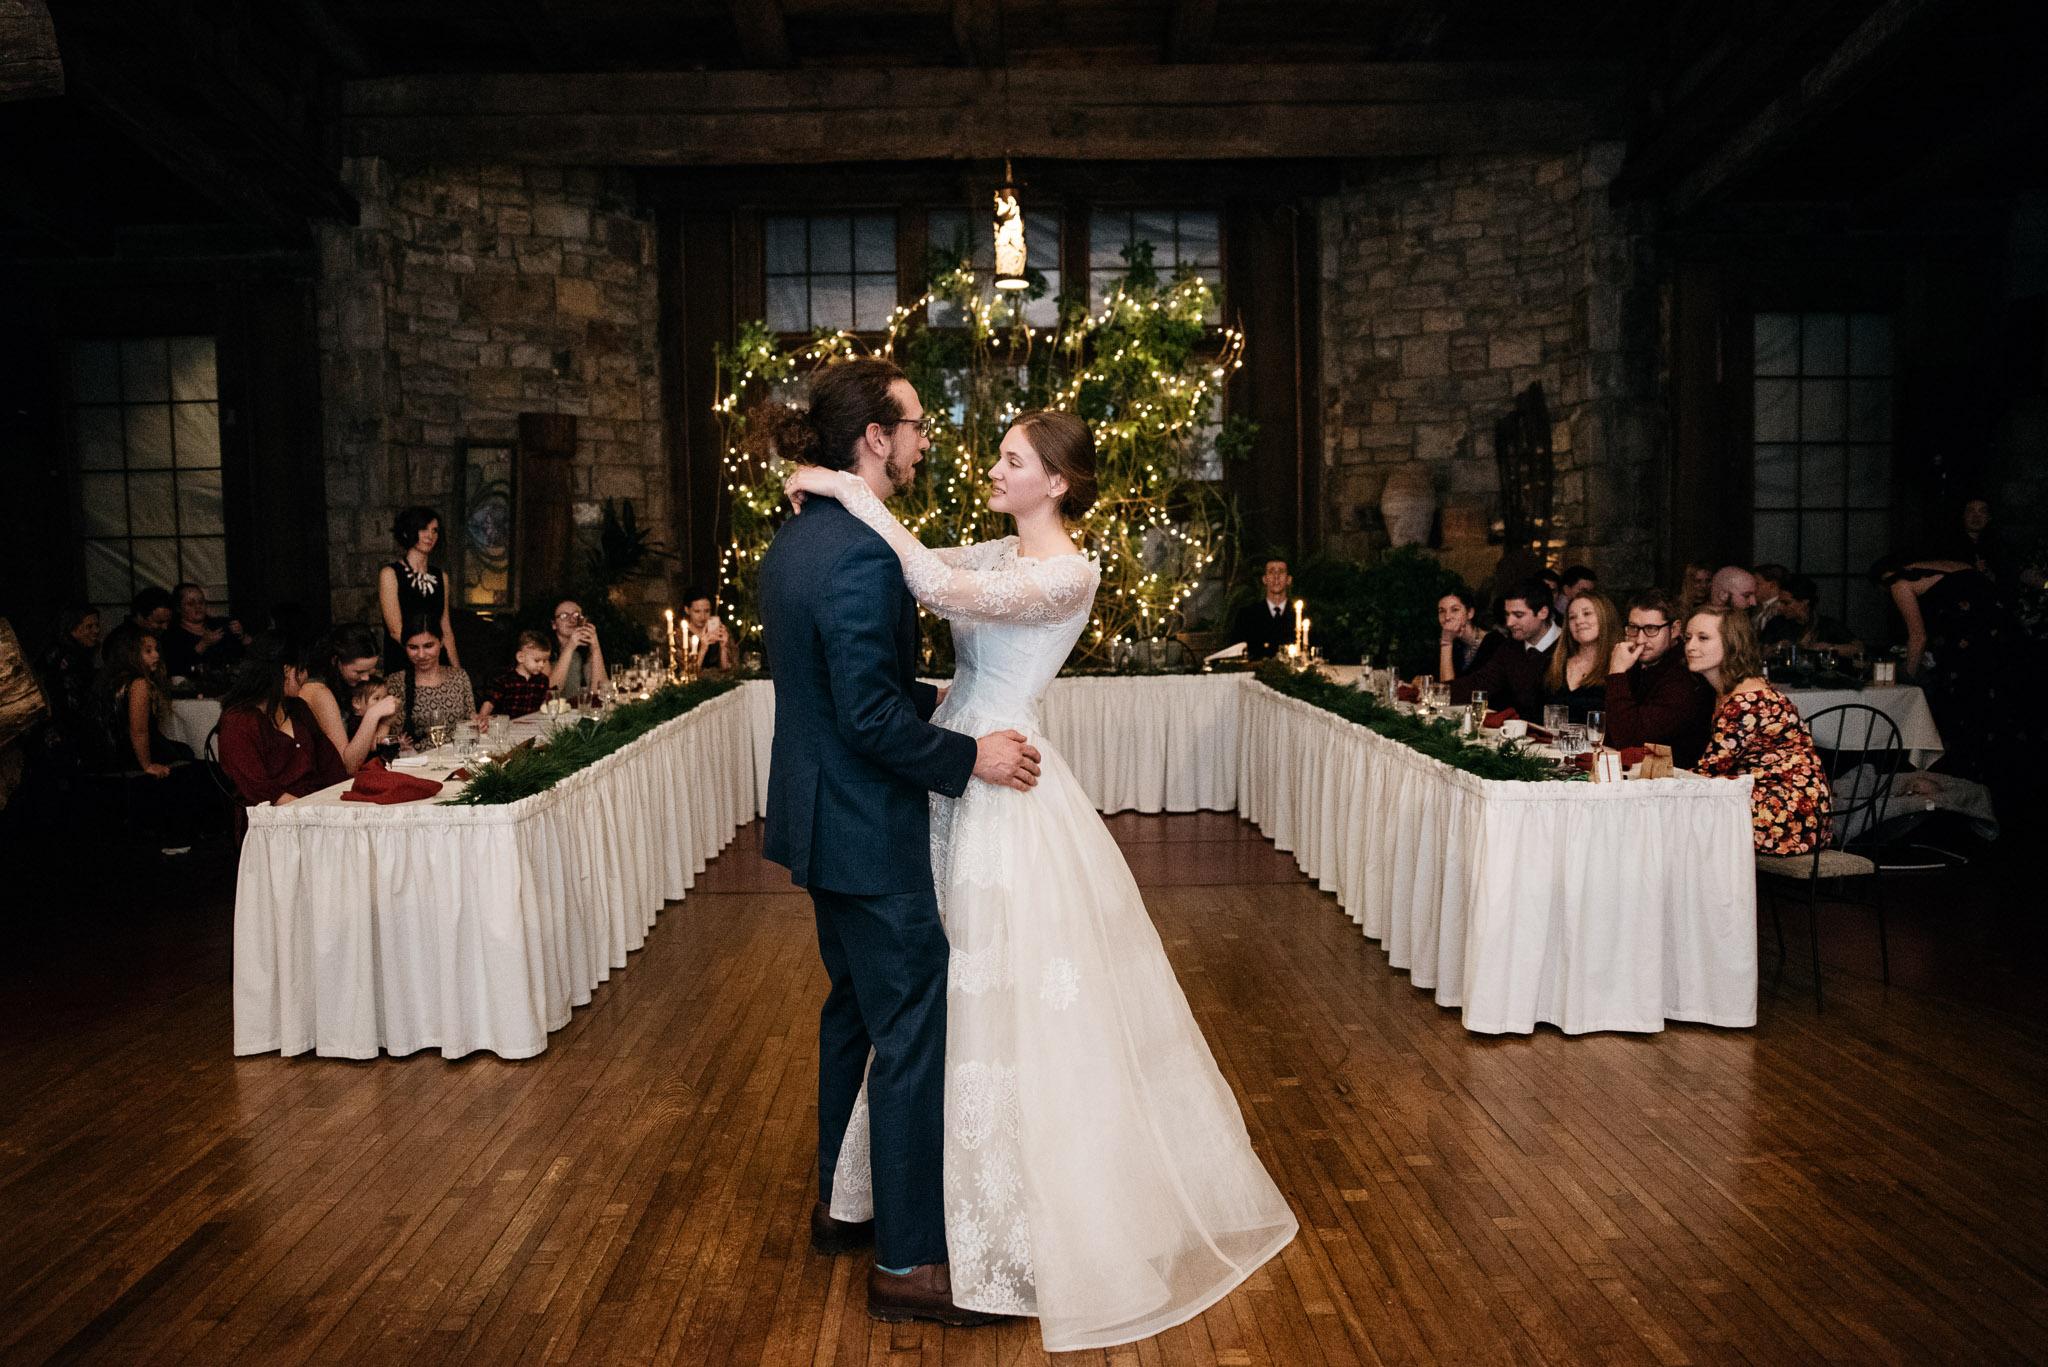 Green Gables Wedding Photographer, first dance, mariah fisher photography-5449.jpg